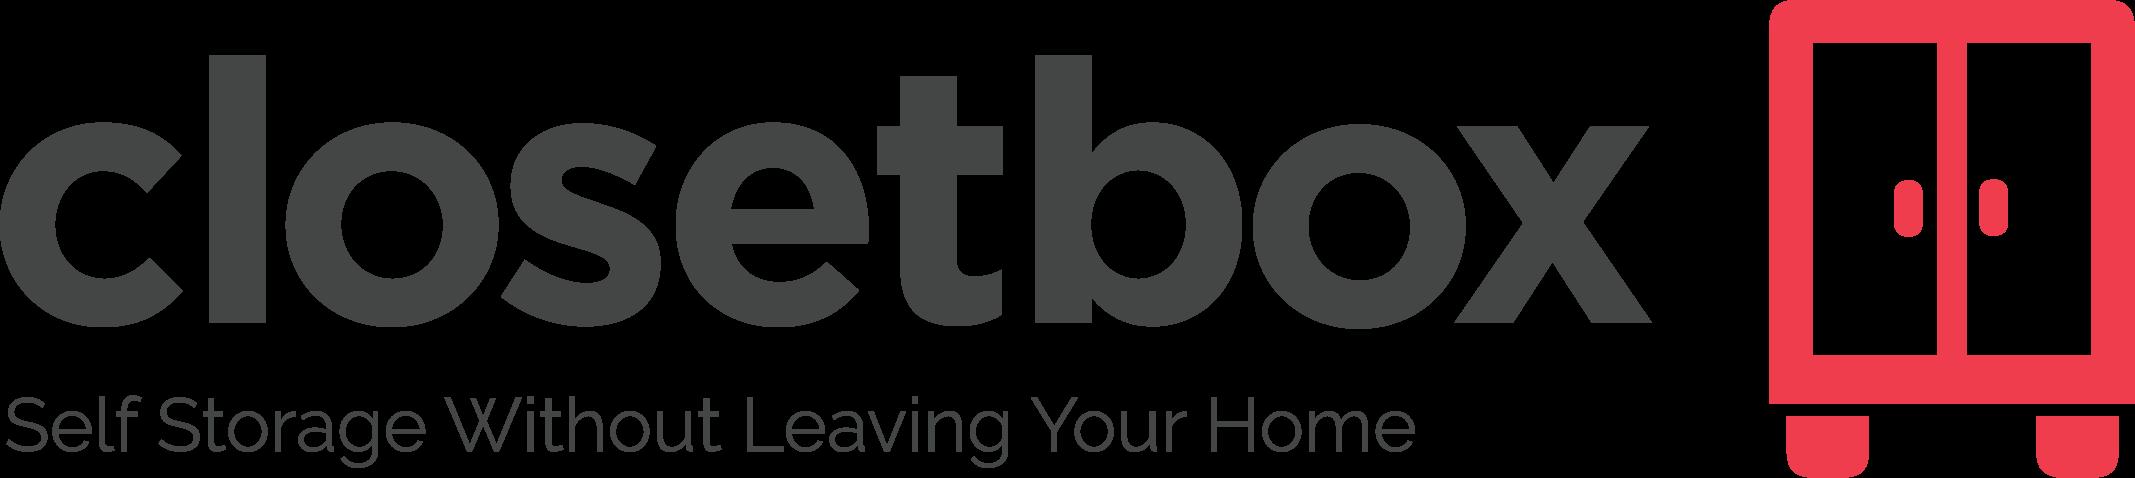 cb-logo-dark-tagline (5).png